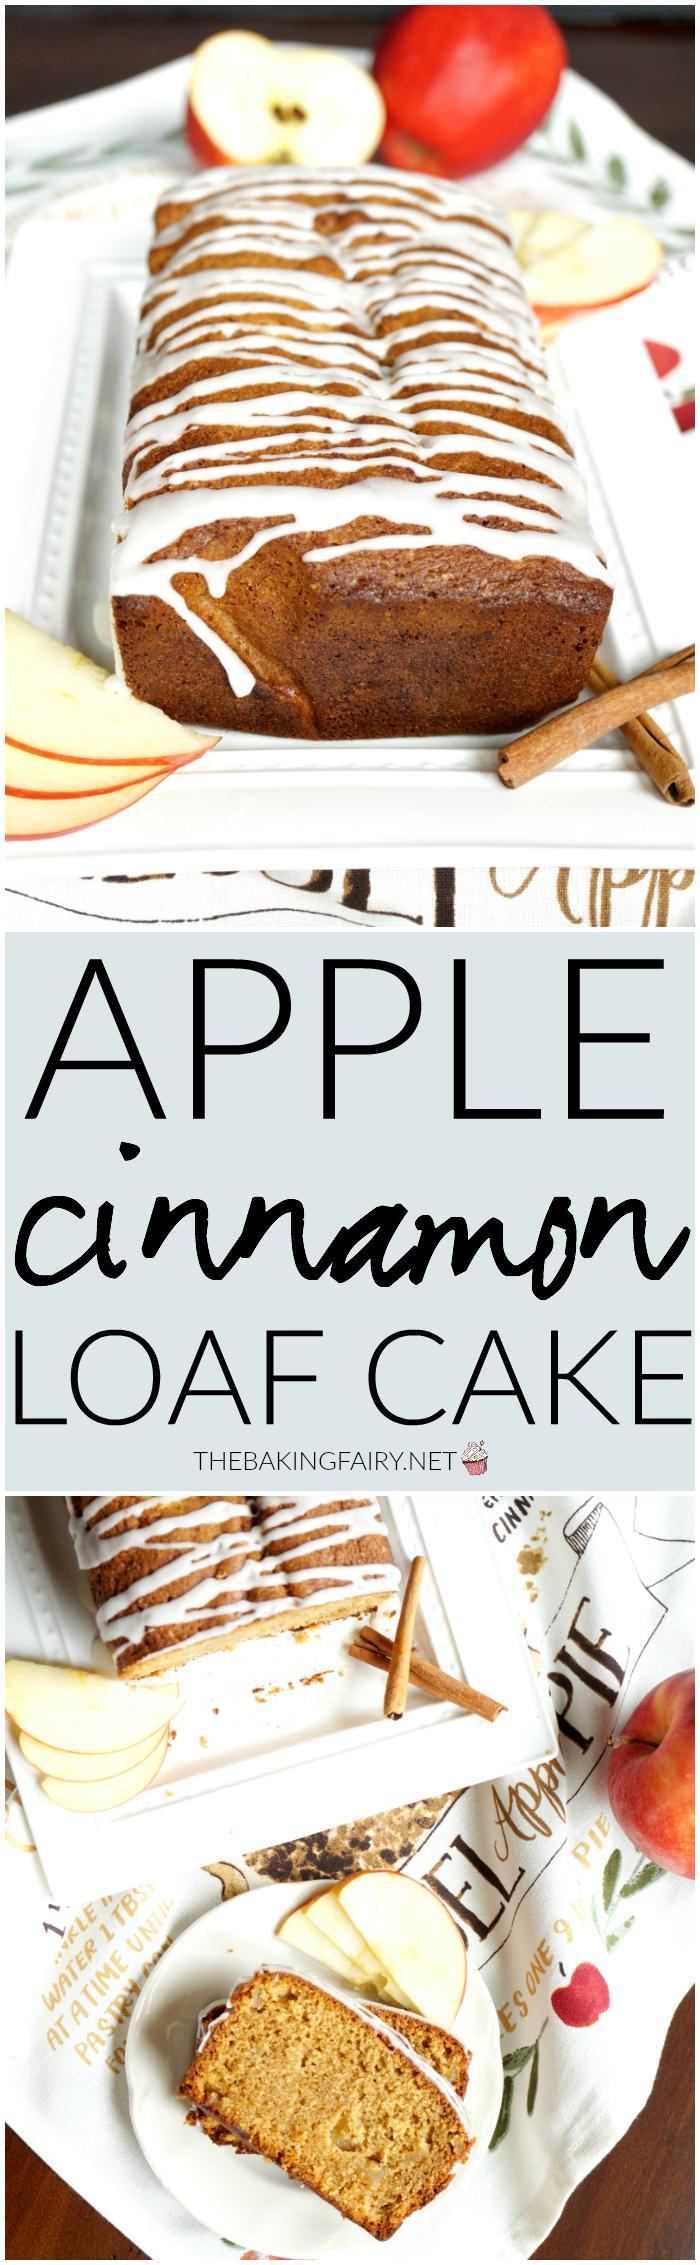 apple cinnamon loaf cake   The Baking Fairy